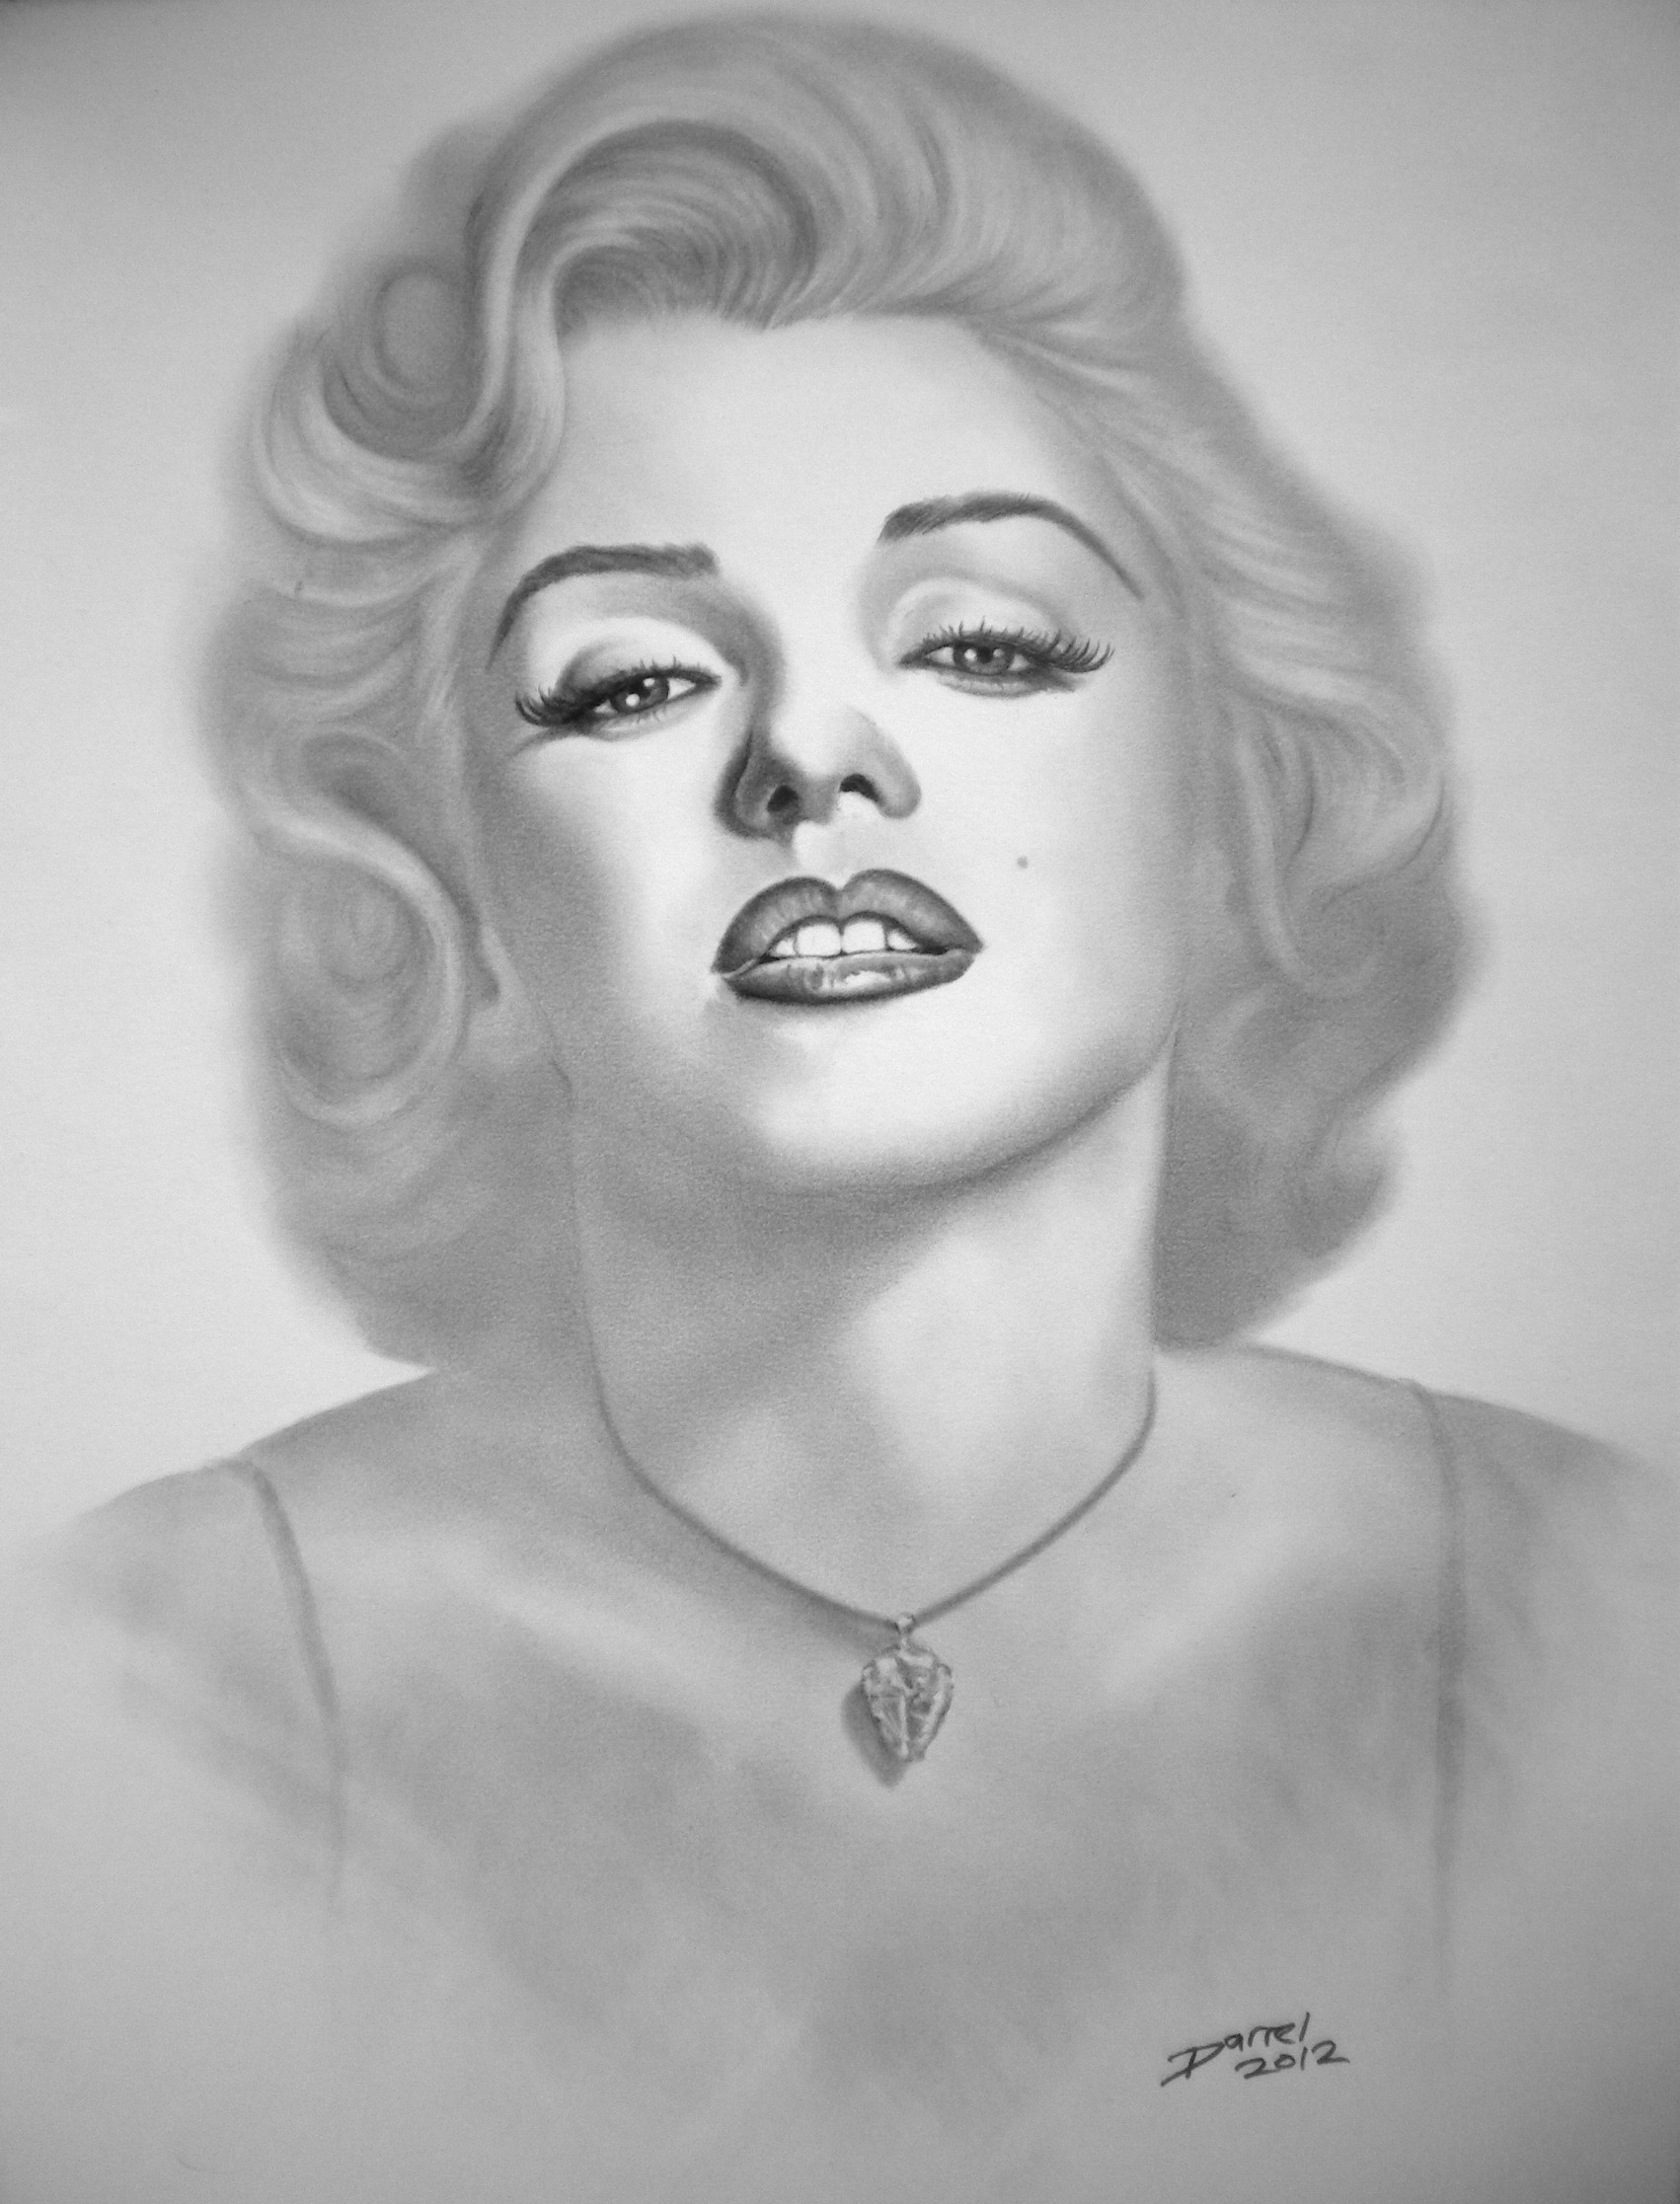 Drawn portrait marilyn monroe Bevan Marilyn Artist Monroe TheOriginalVanGoghsEarAnthology